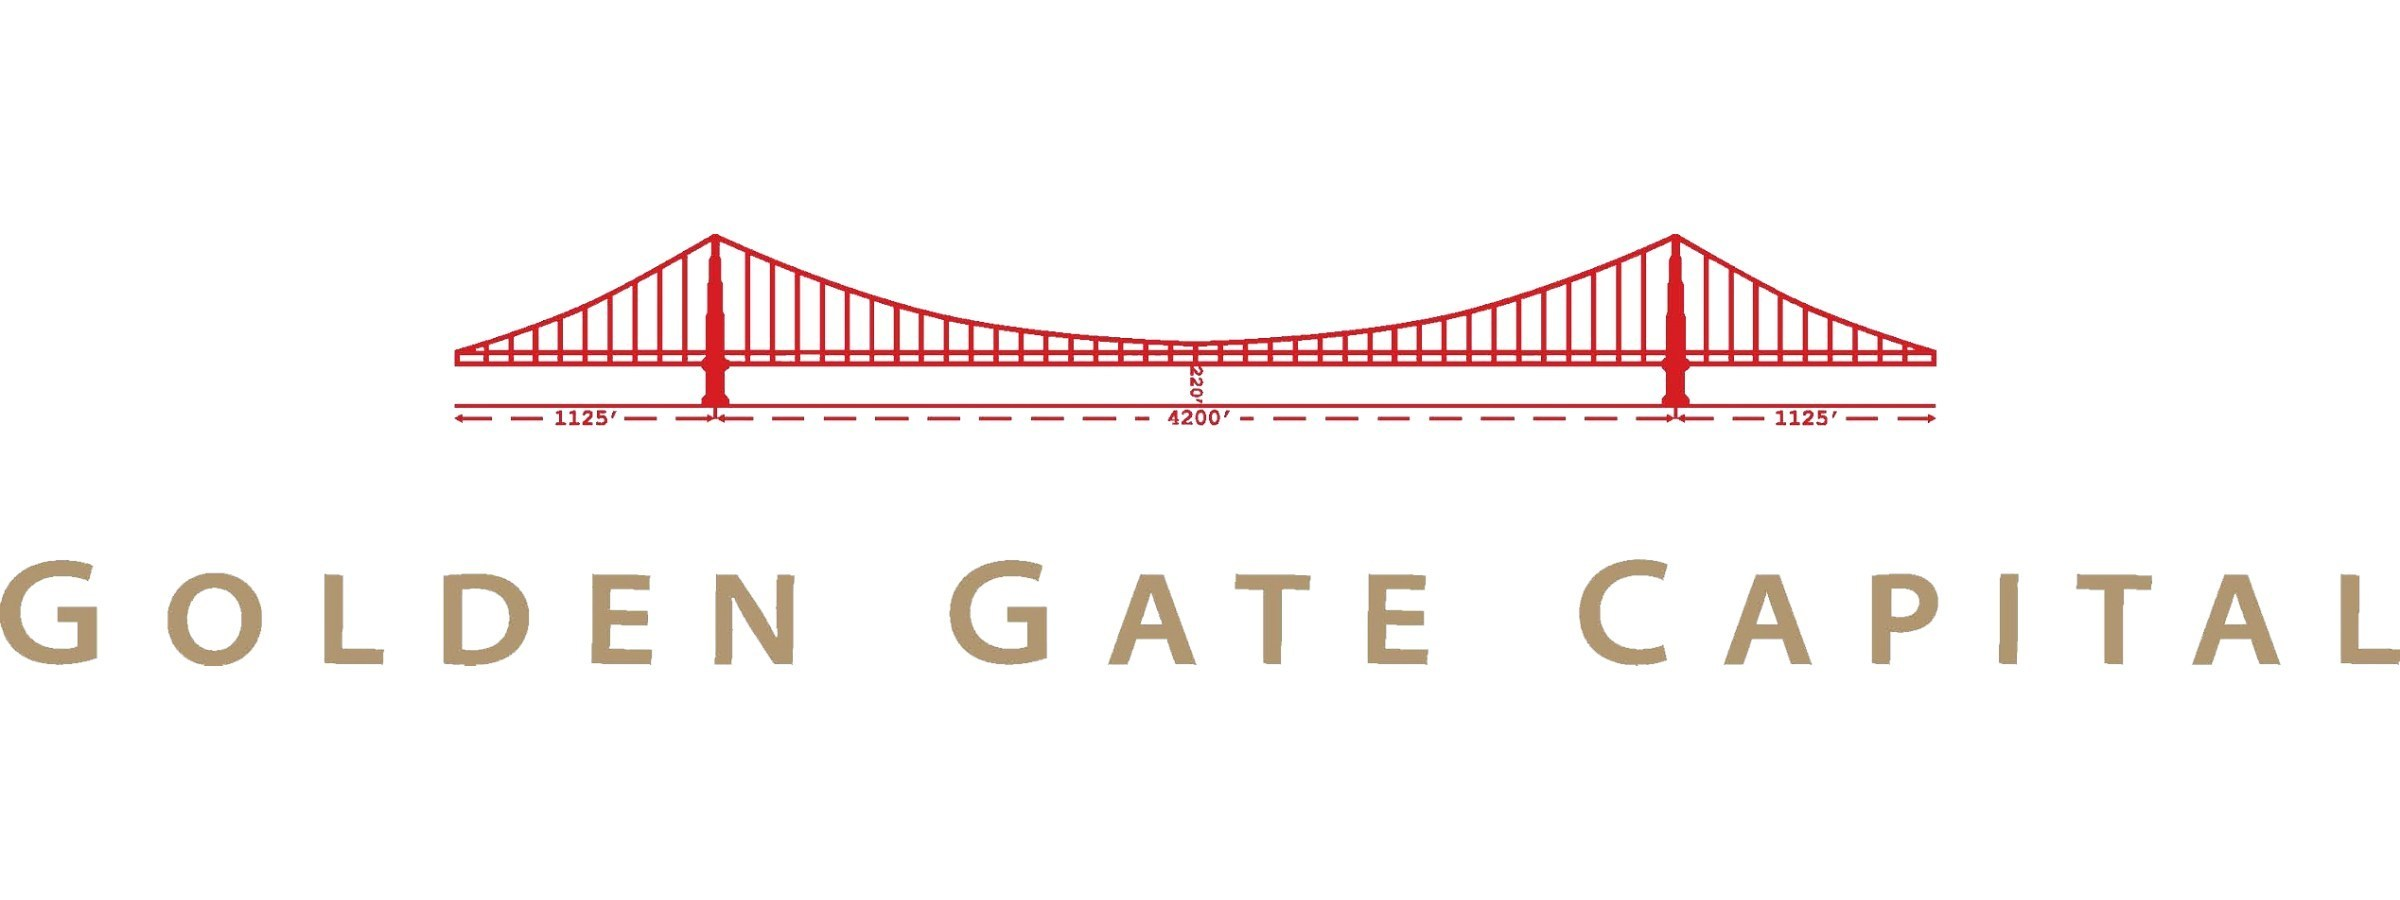 Golden Gate Capital